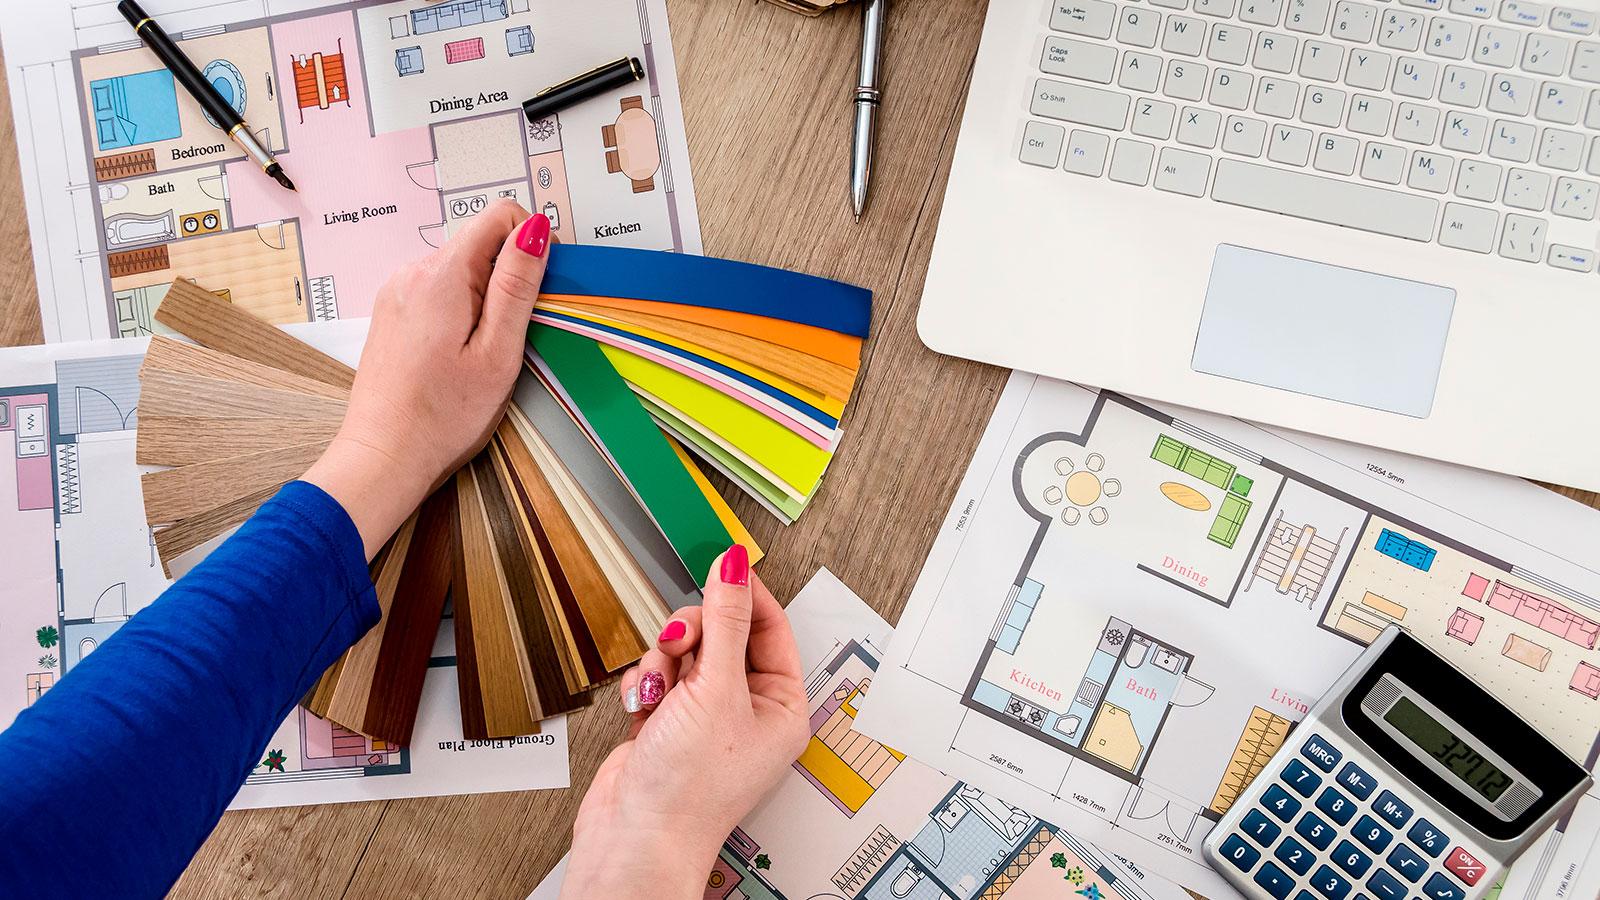 curso-design-interiores-criacao-conecpcao